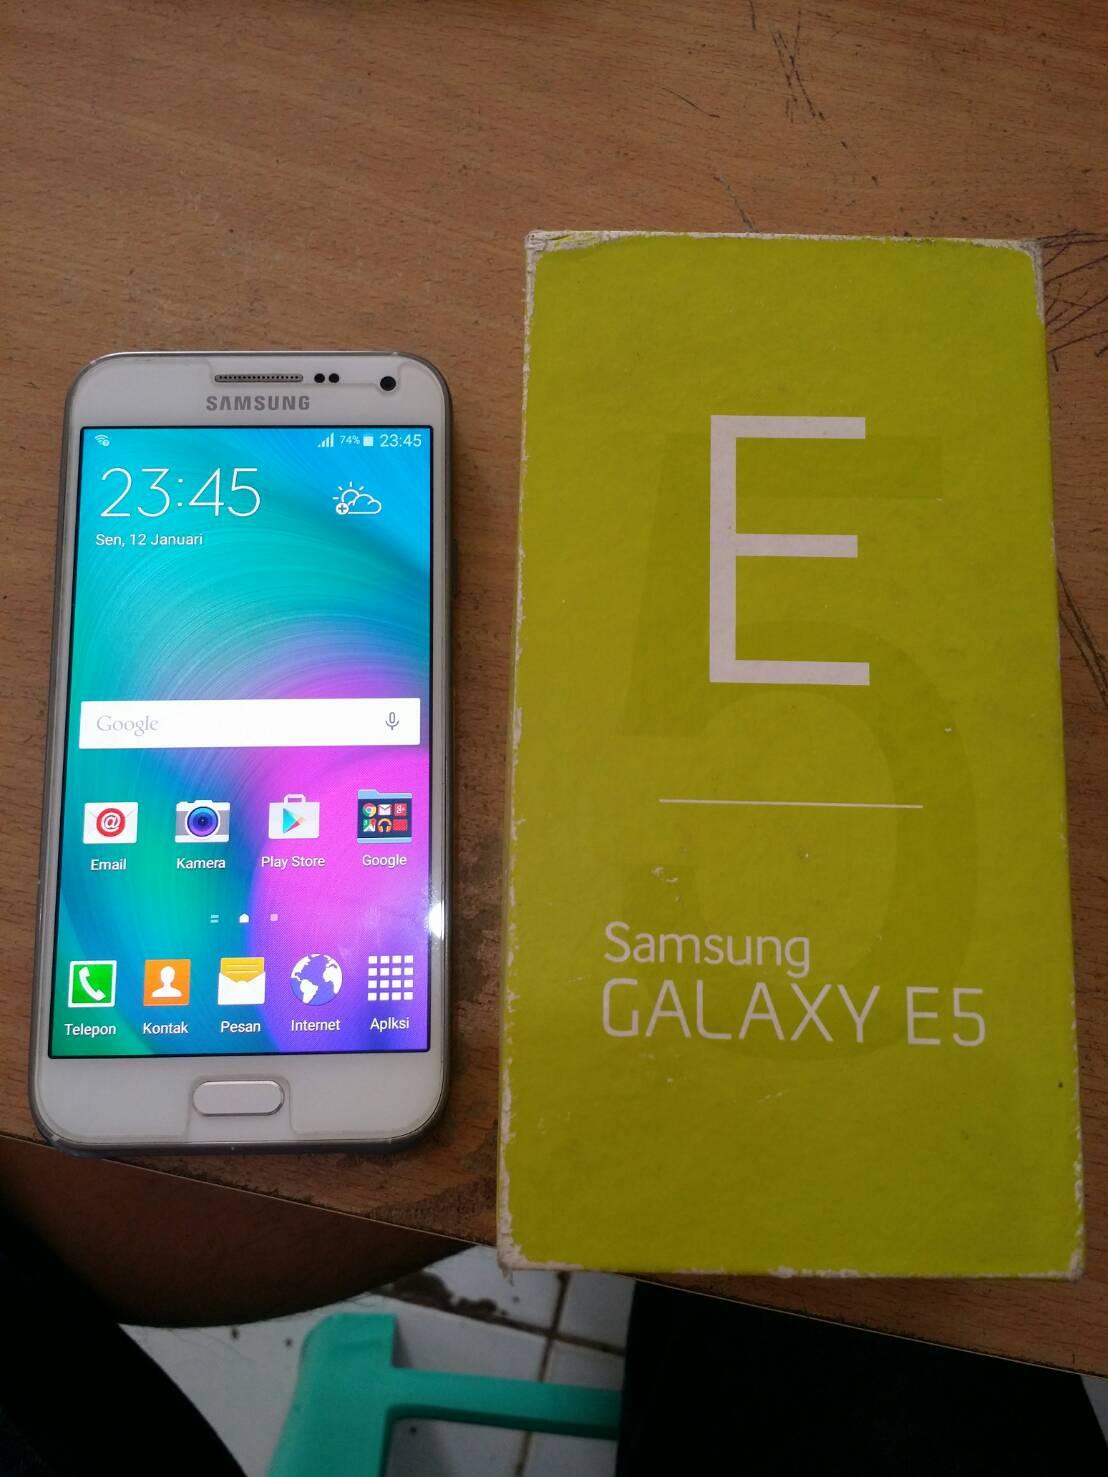 Spesifikasi Harga Samsung E5 Bekas Vinny Oleo Vegetal Info